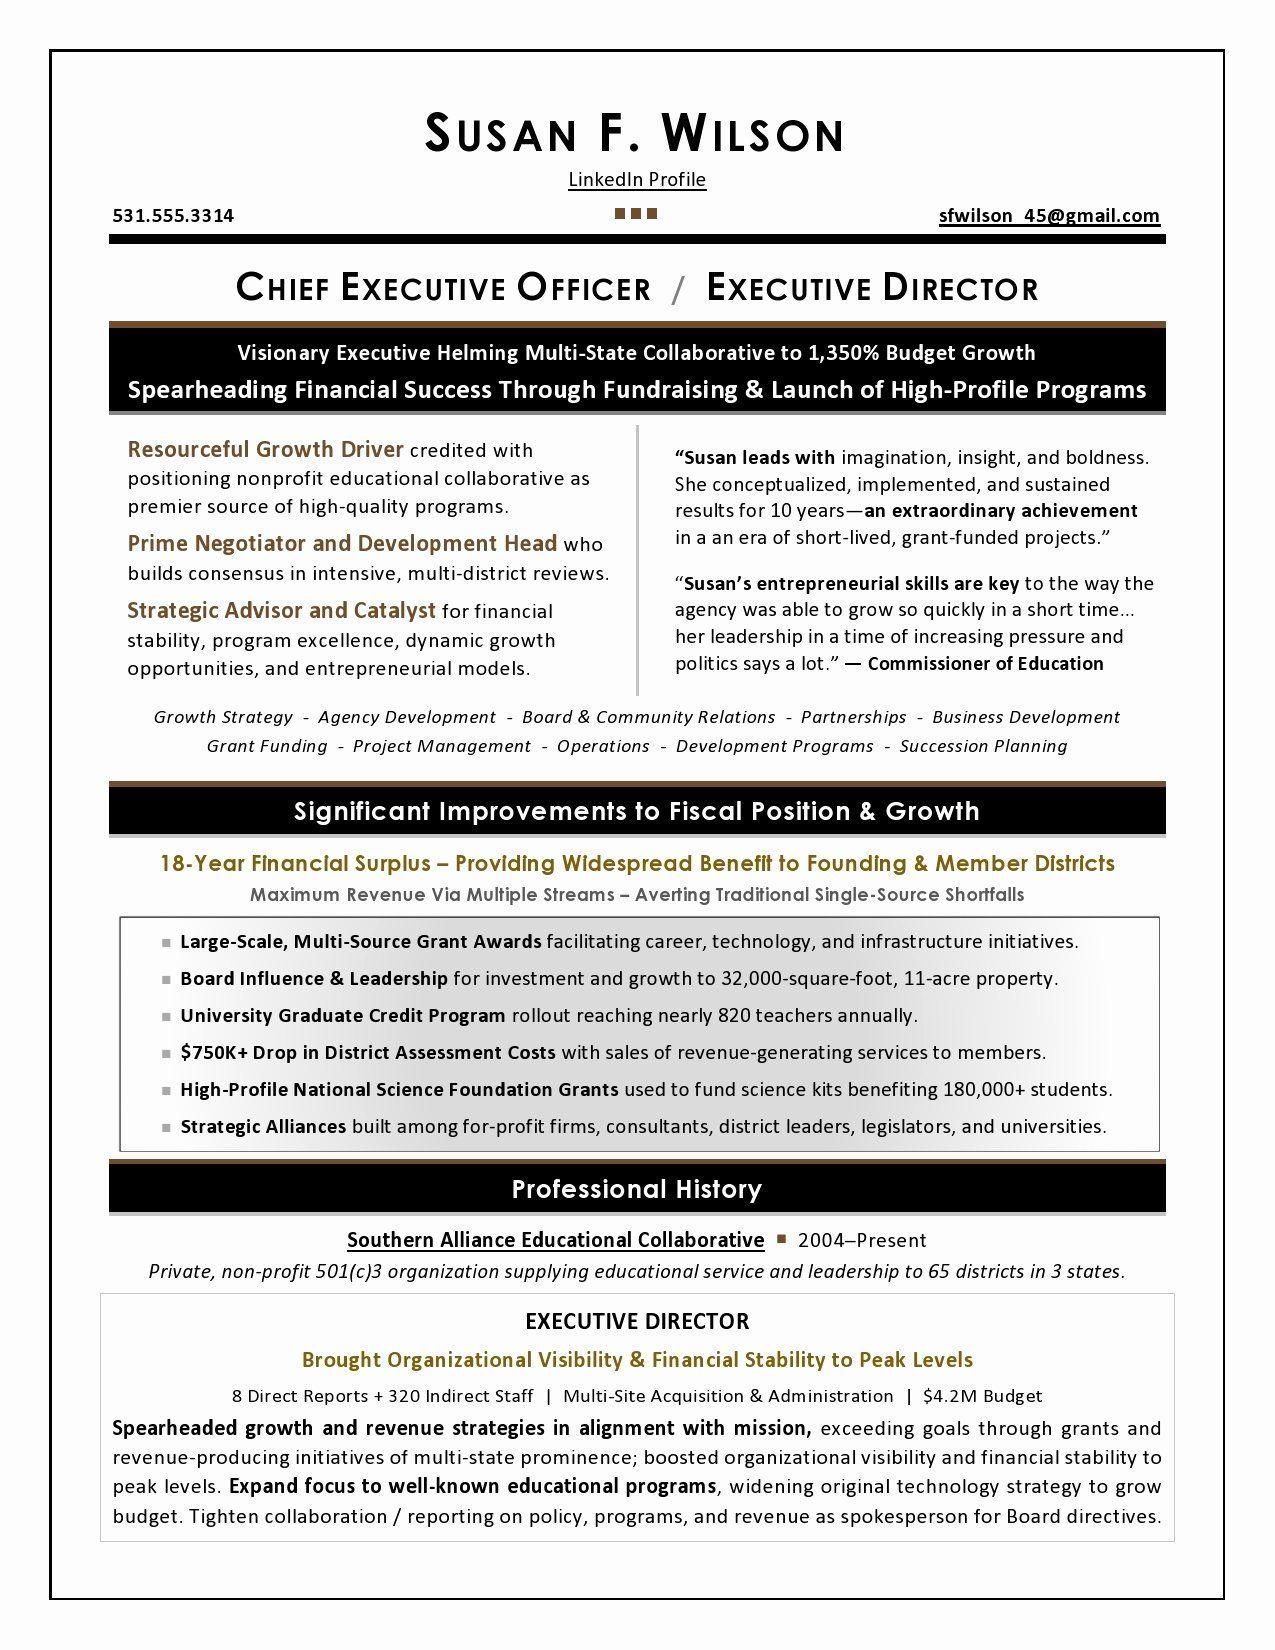 Business development executive resume fresh executive